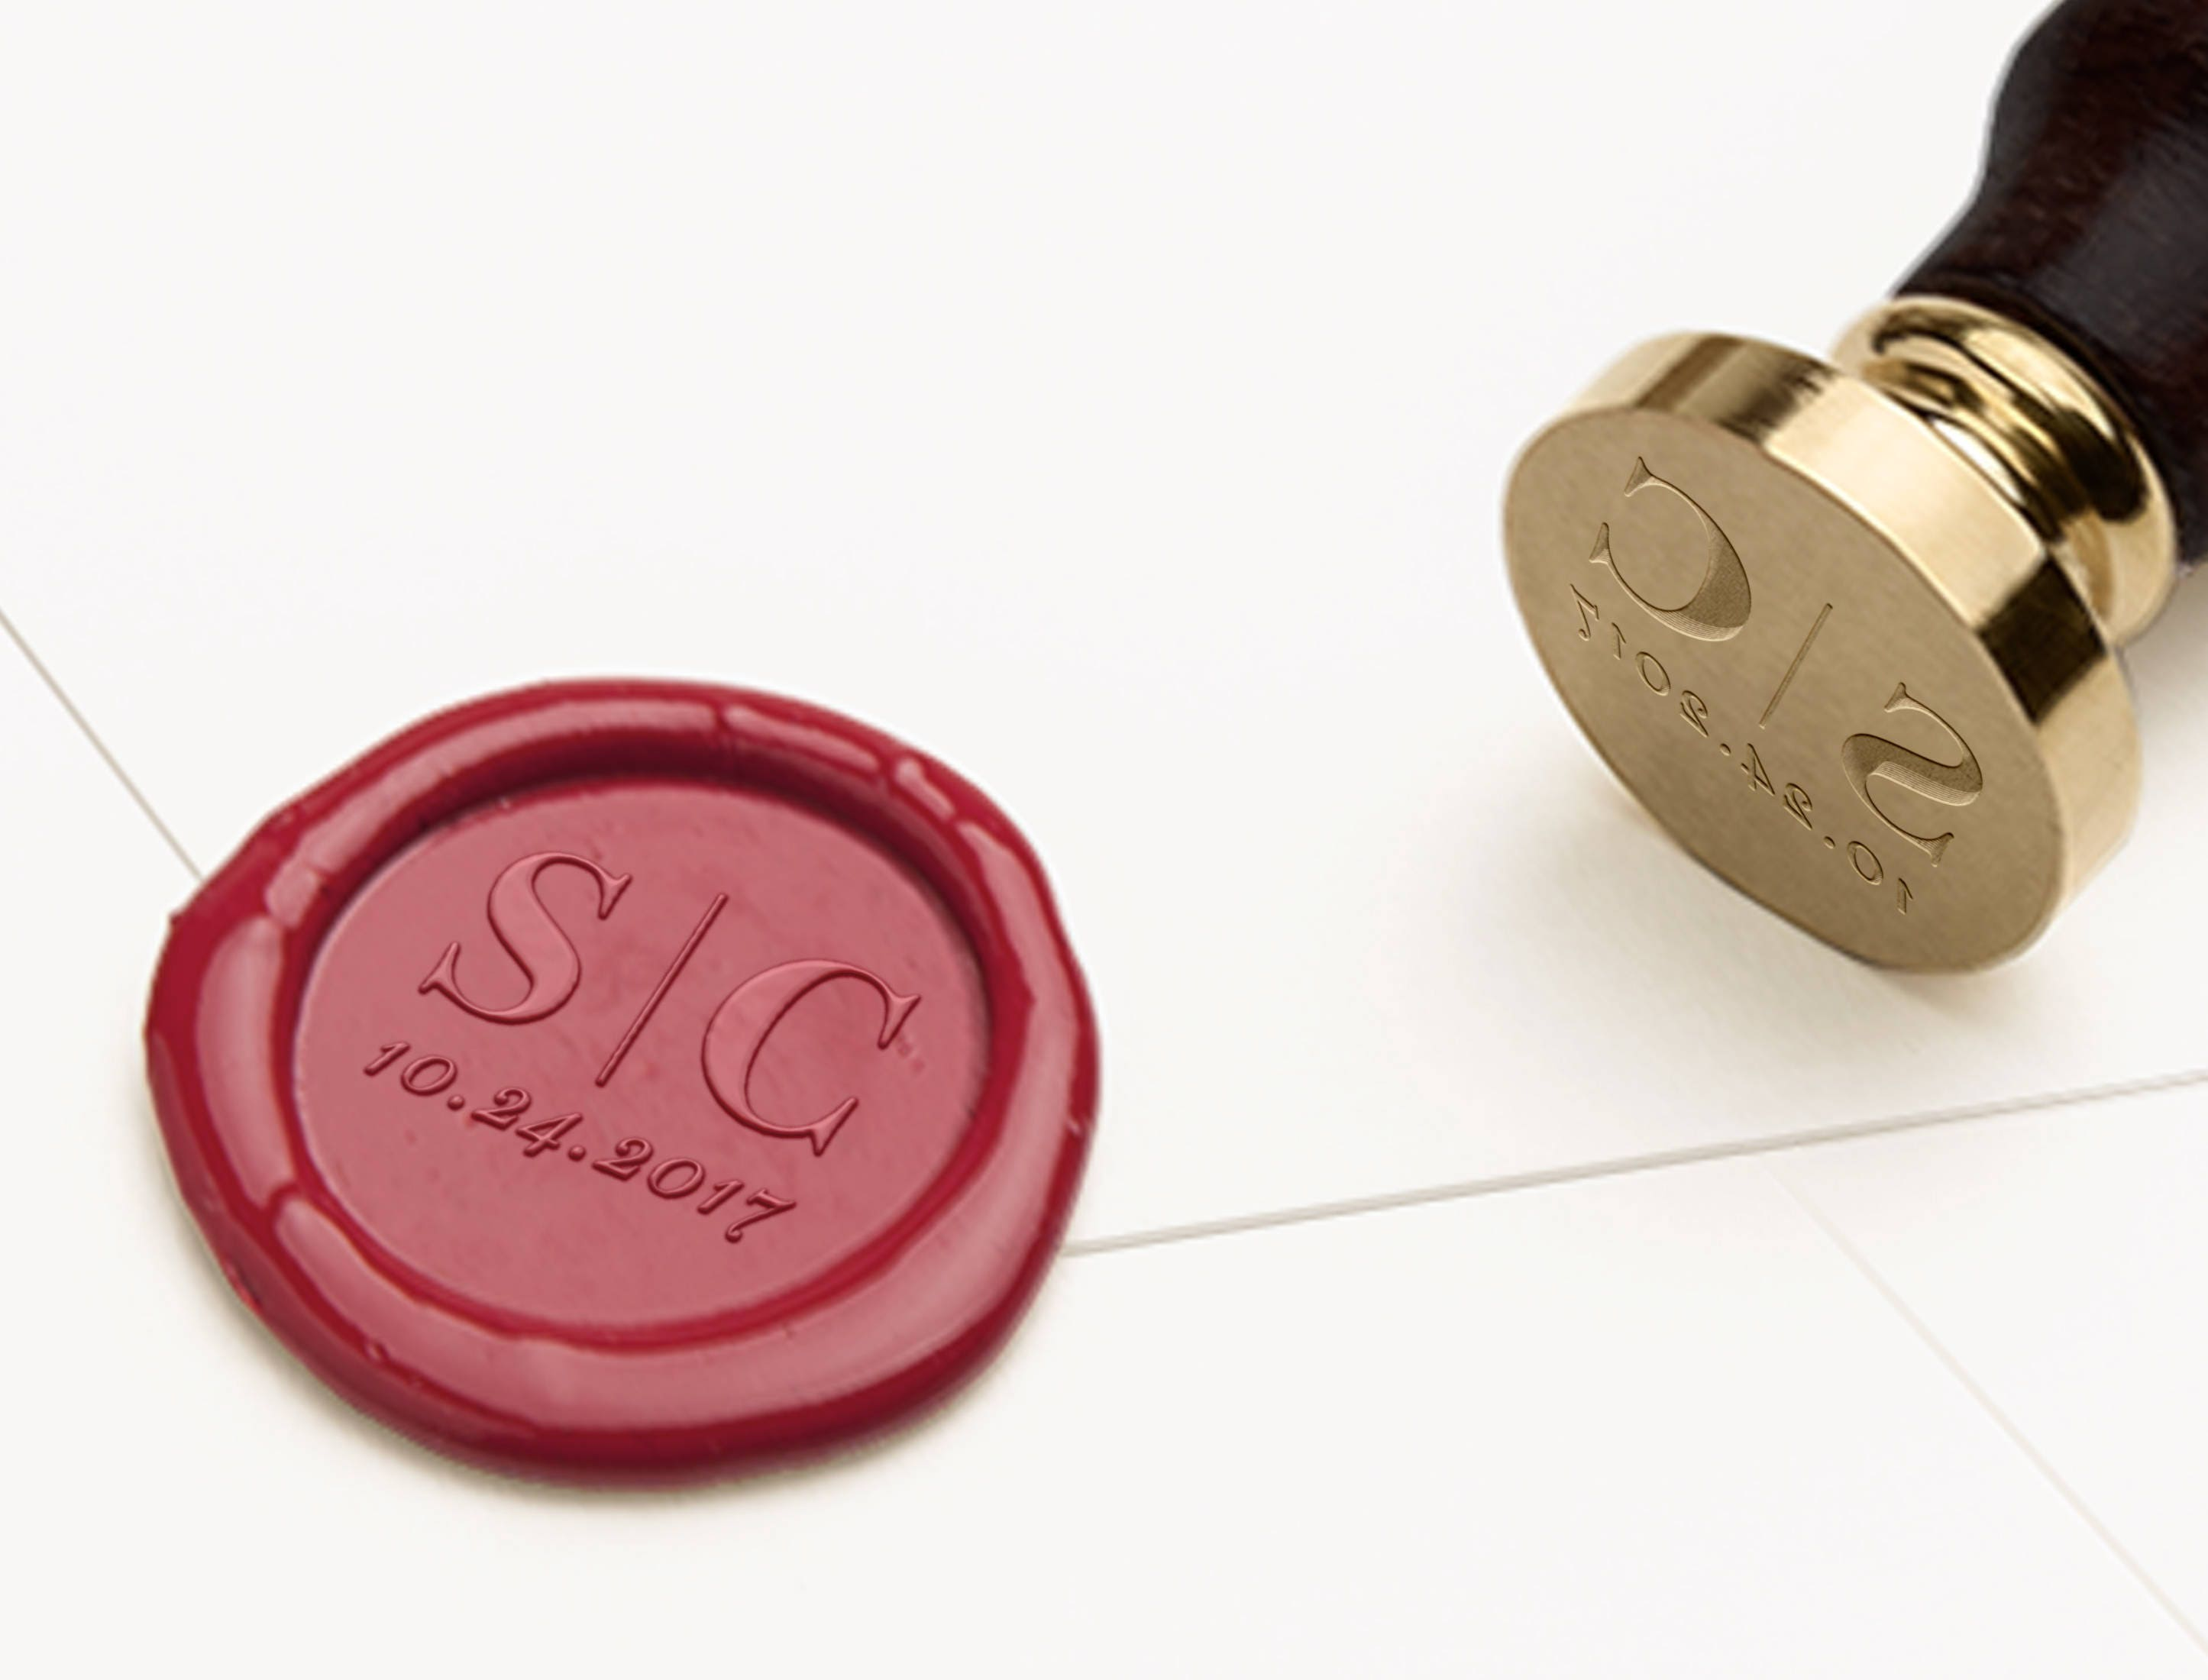 Save the Date Initials Wax Seal Monogram Wax Seal Wedding   Etsy